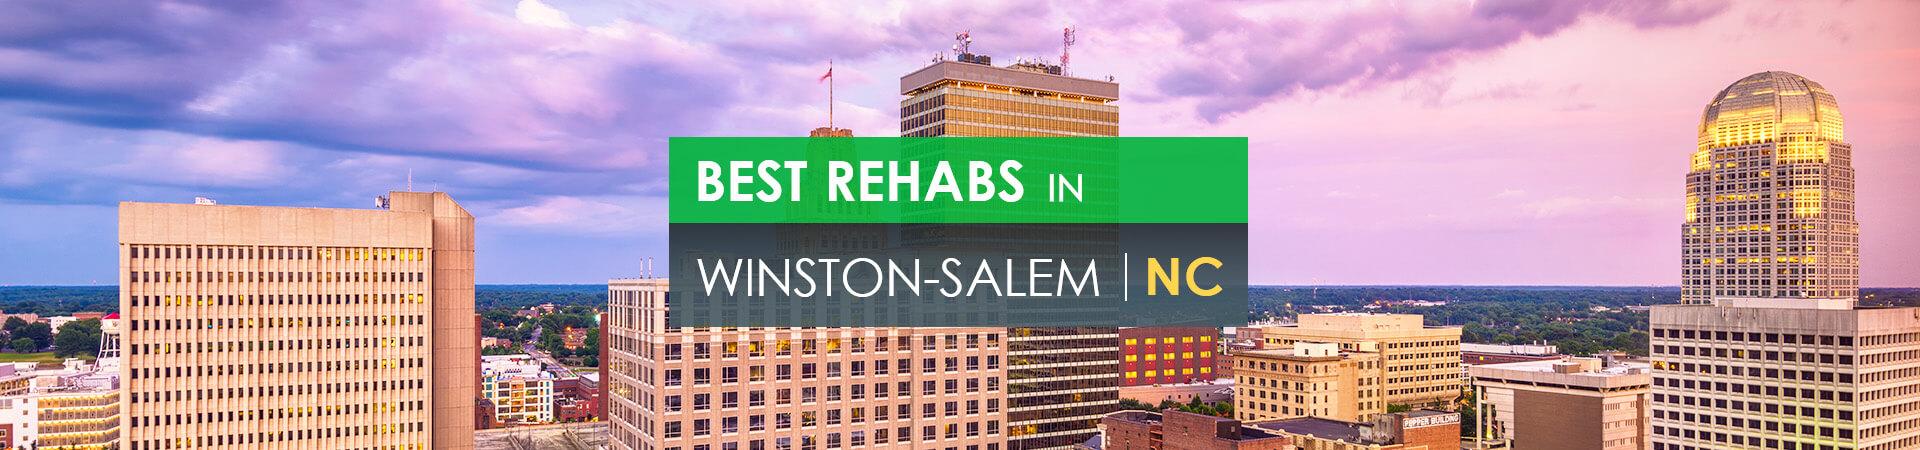 Best rehabs in Winston-Salem, NC